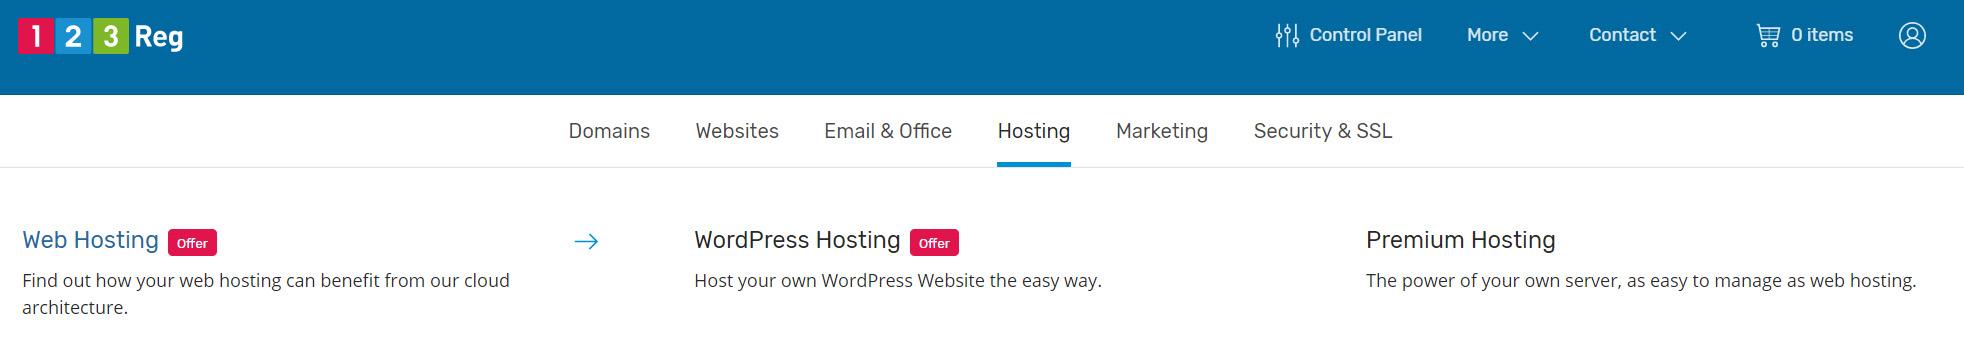 Select Web Hosting